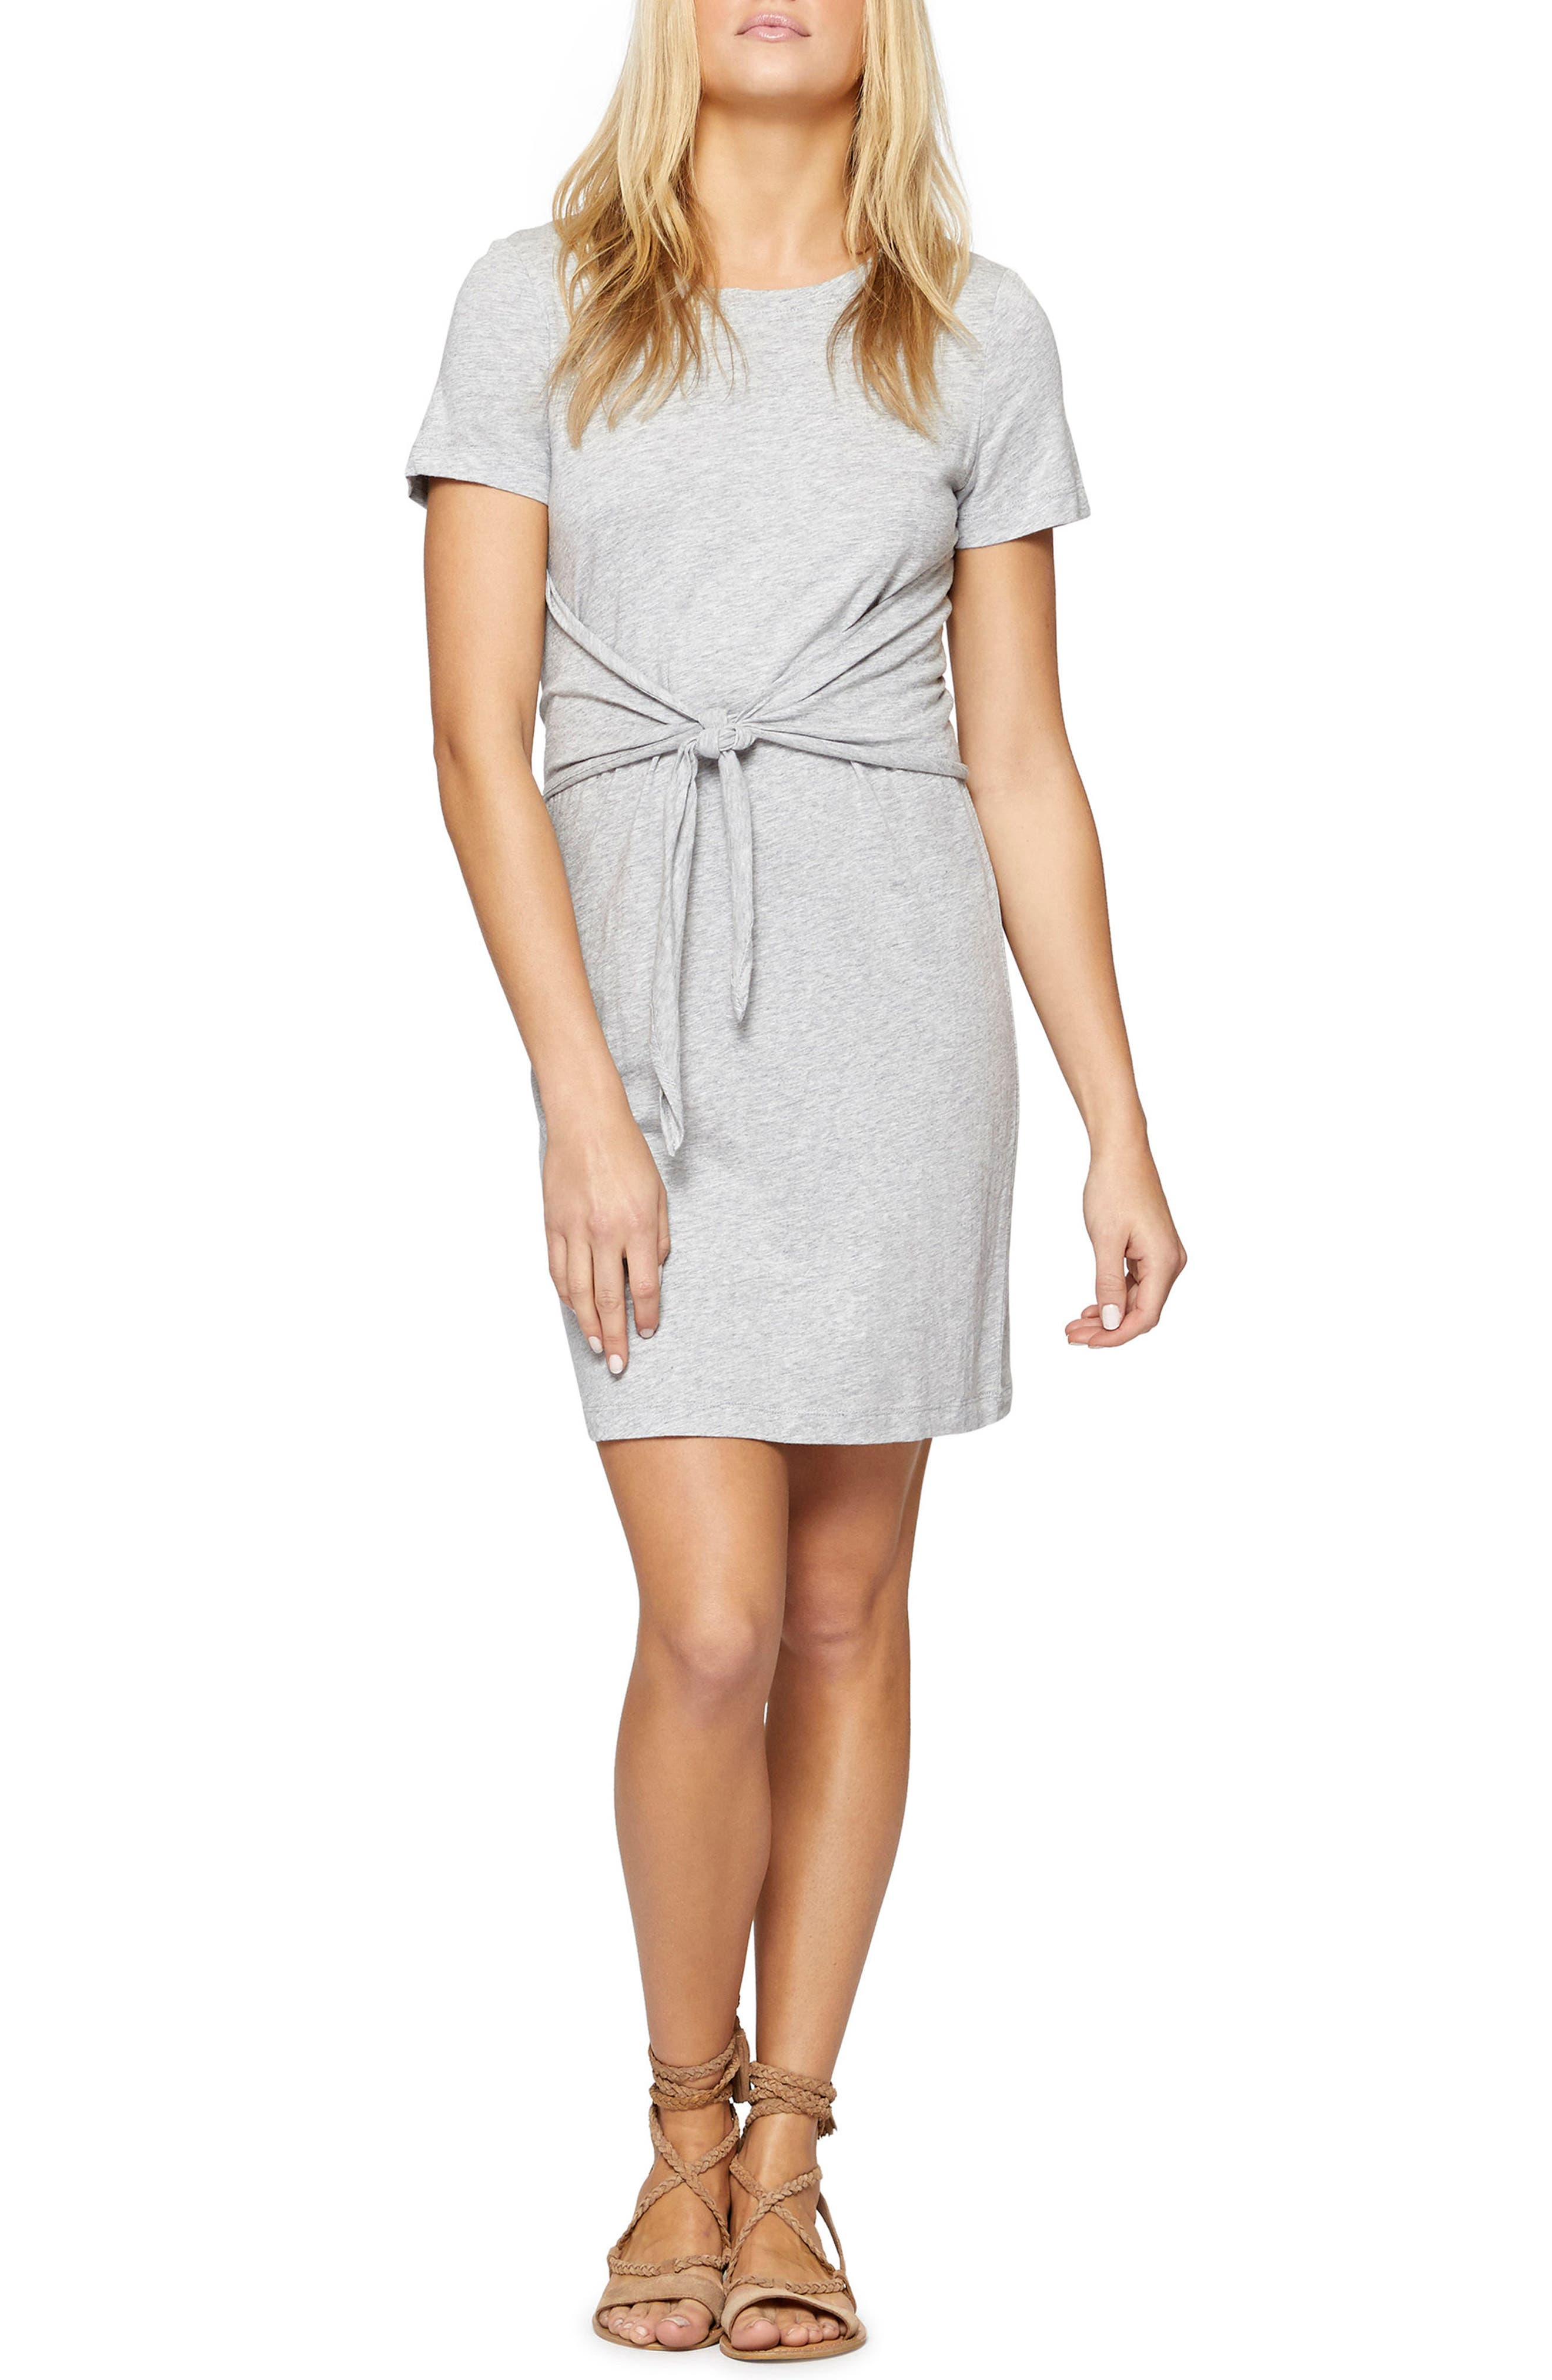 Alternate Image 1 Selected - Sanctuary Juno Tie Waist T-Shirt Dress